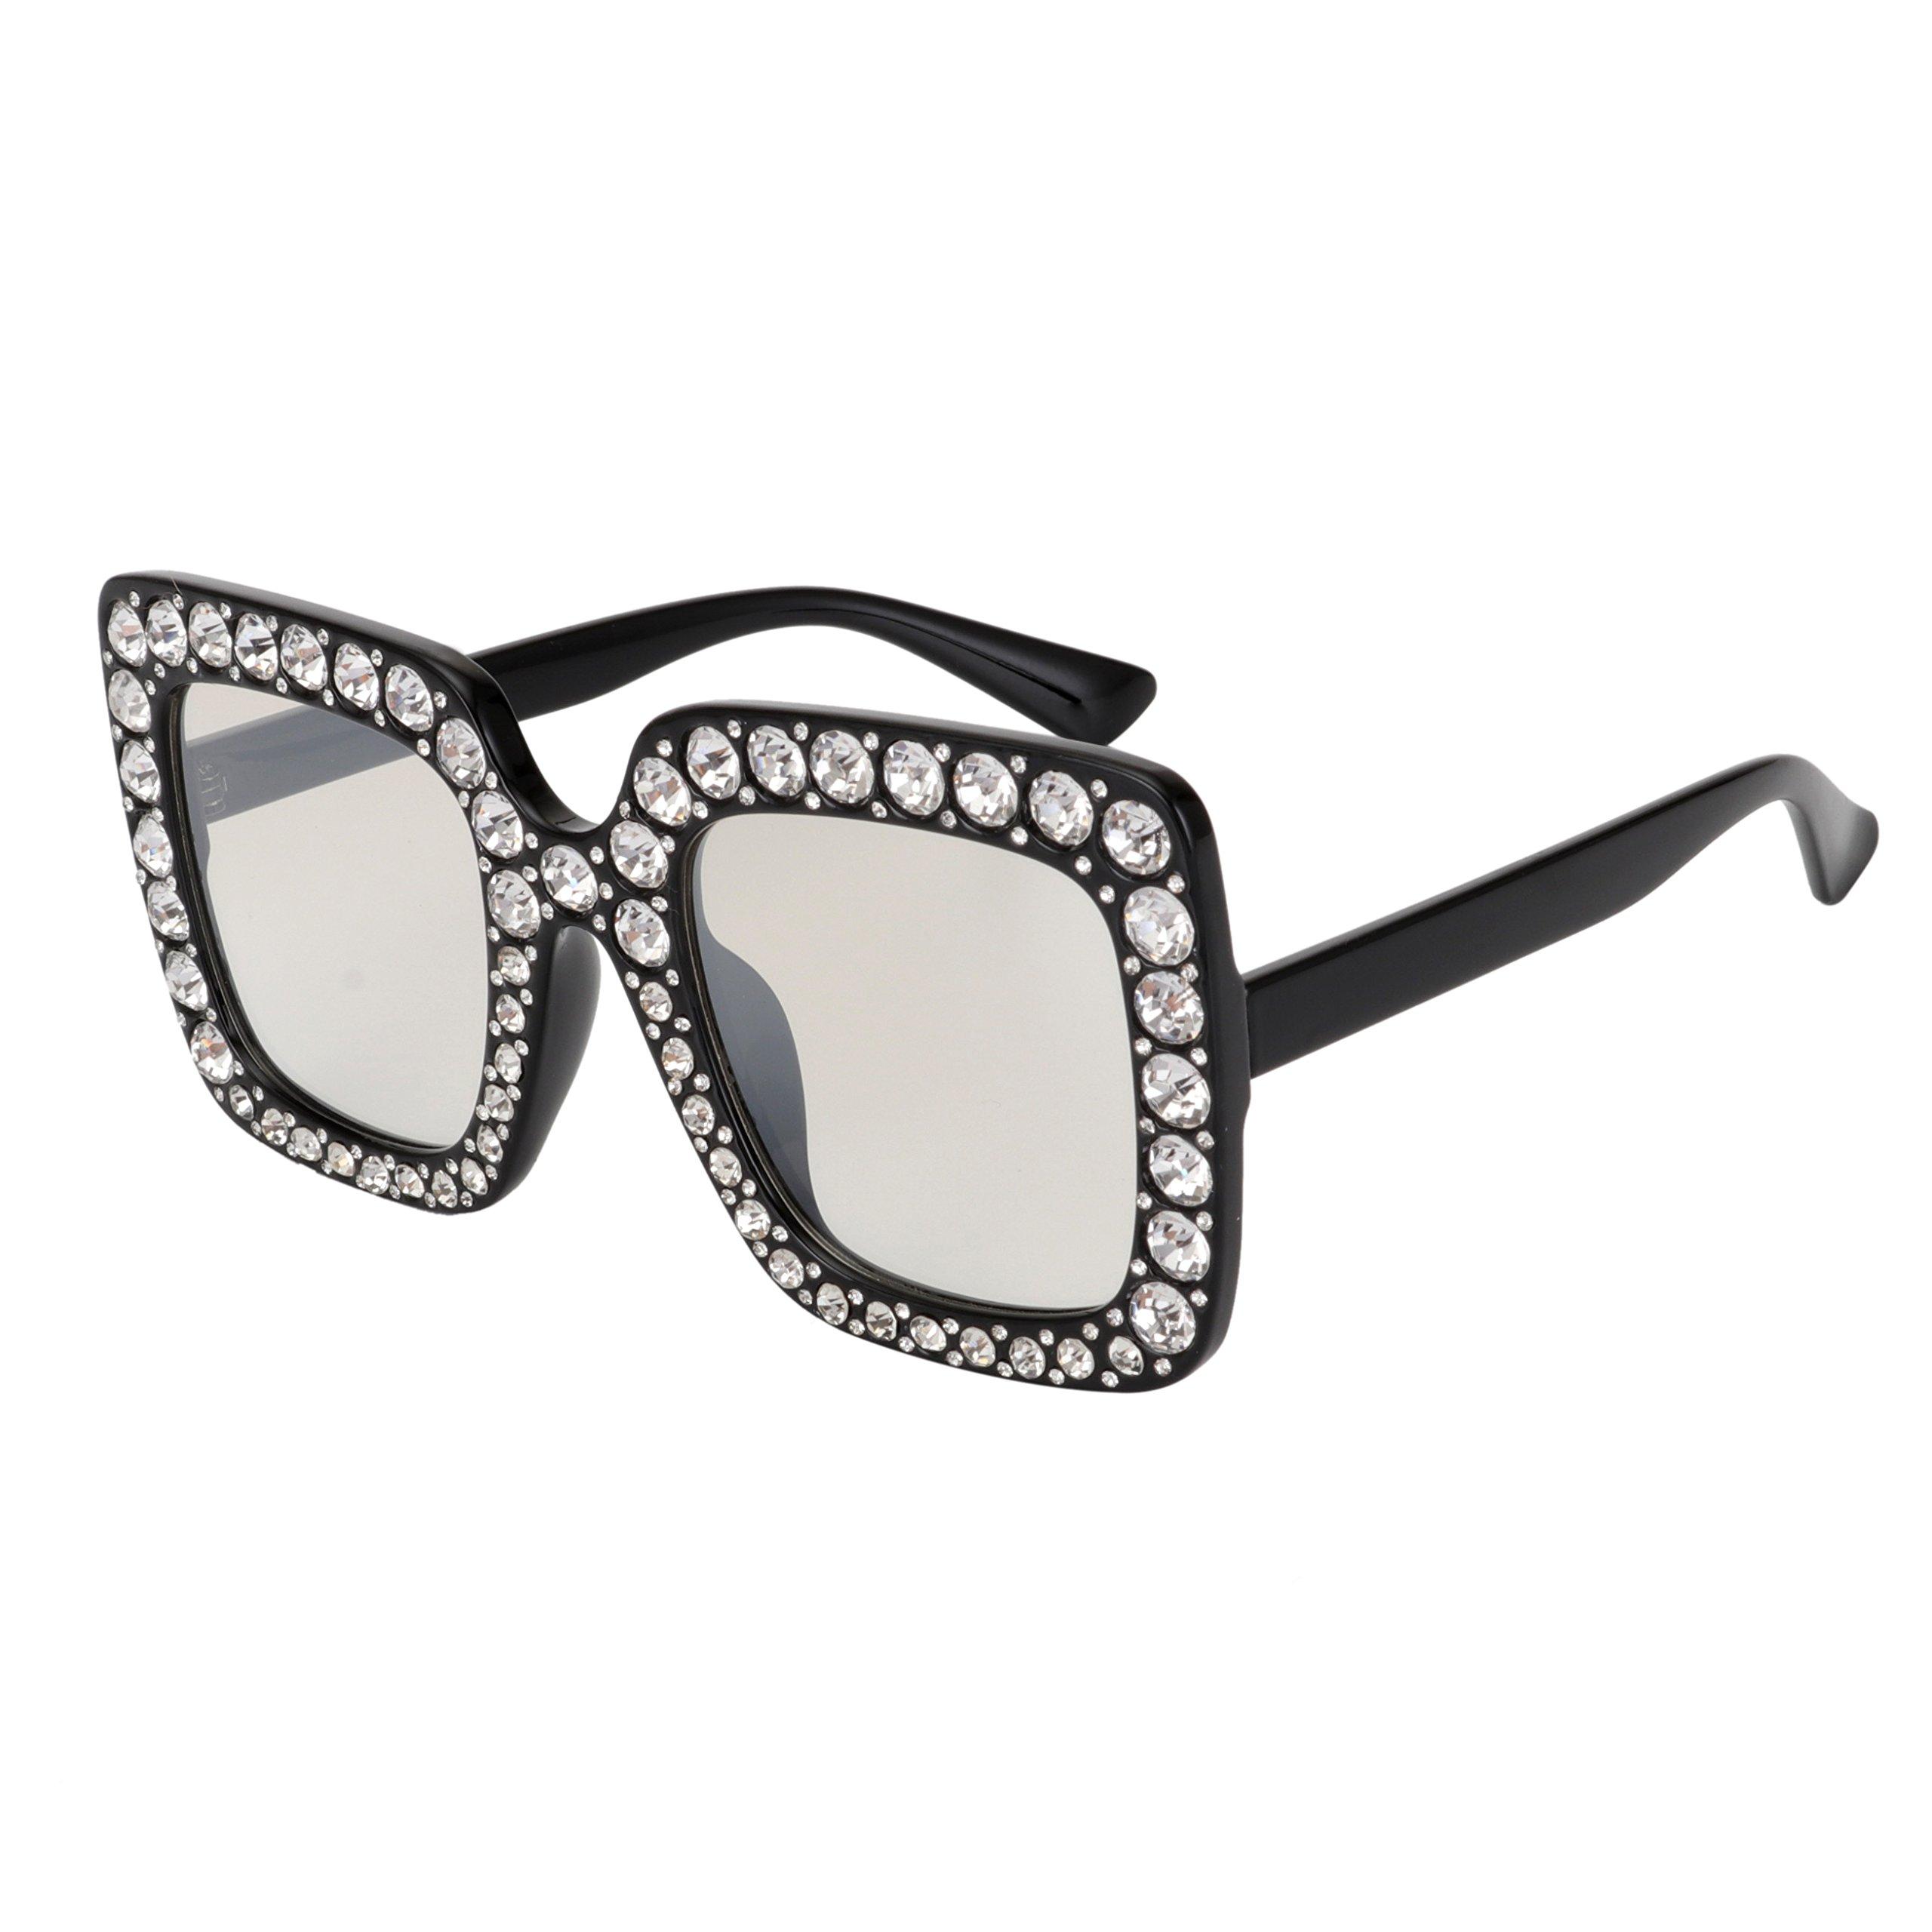 de69ae7f79 Galleon - ROYAL GIRL Sunglasses For Women Oversized Square Luxury Crystal  Frame Brand Designer Fashion Glasses (Black-Clear